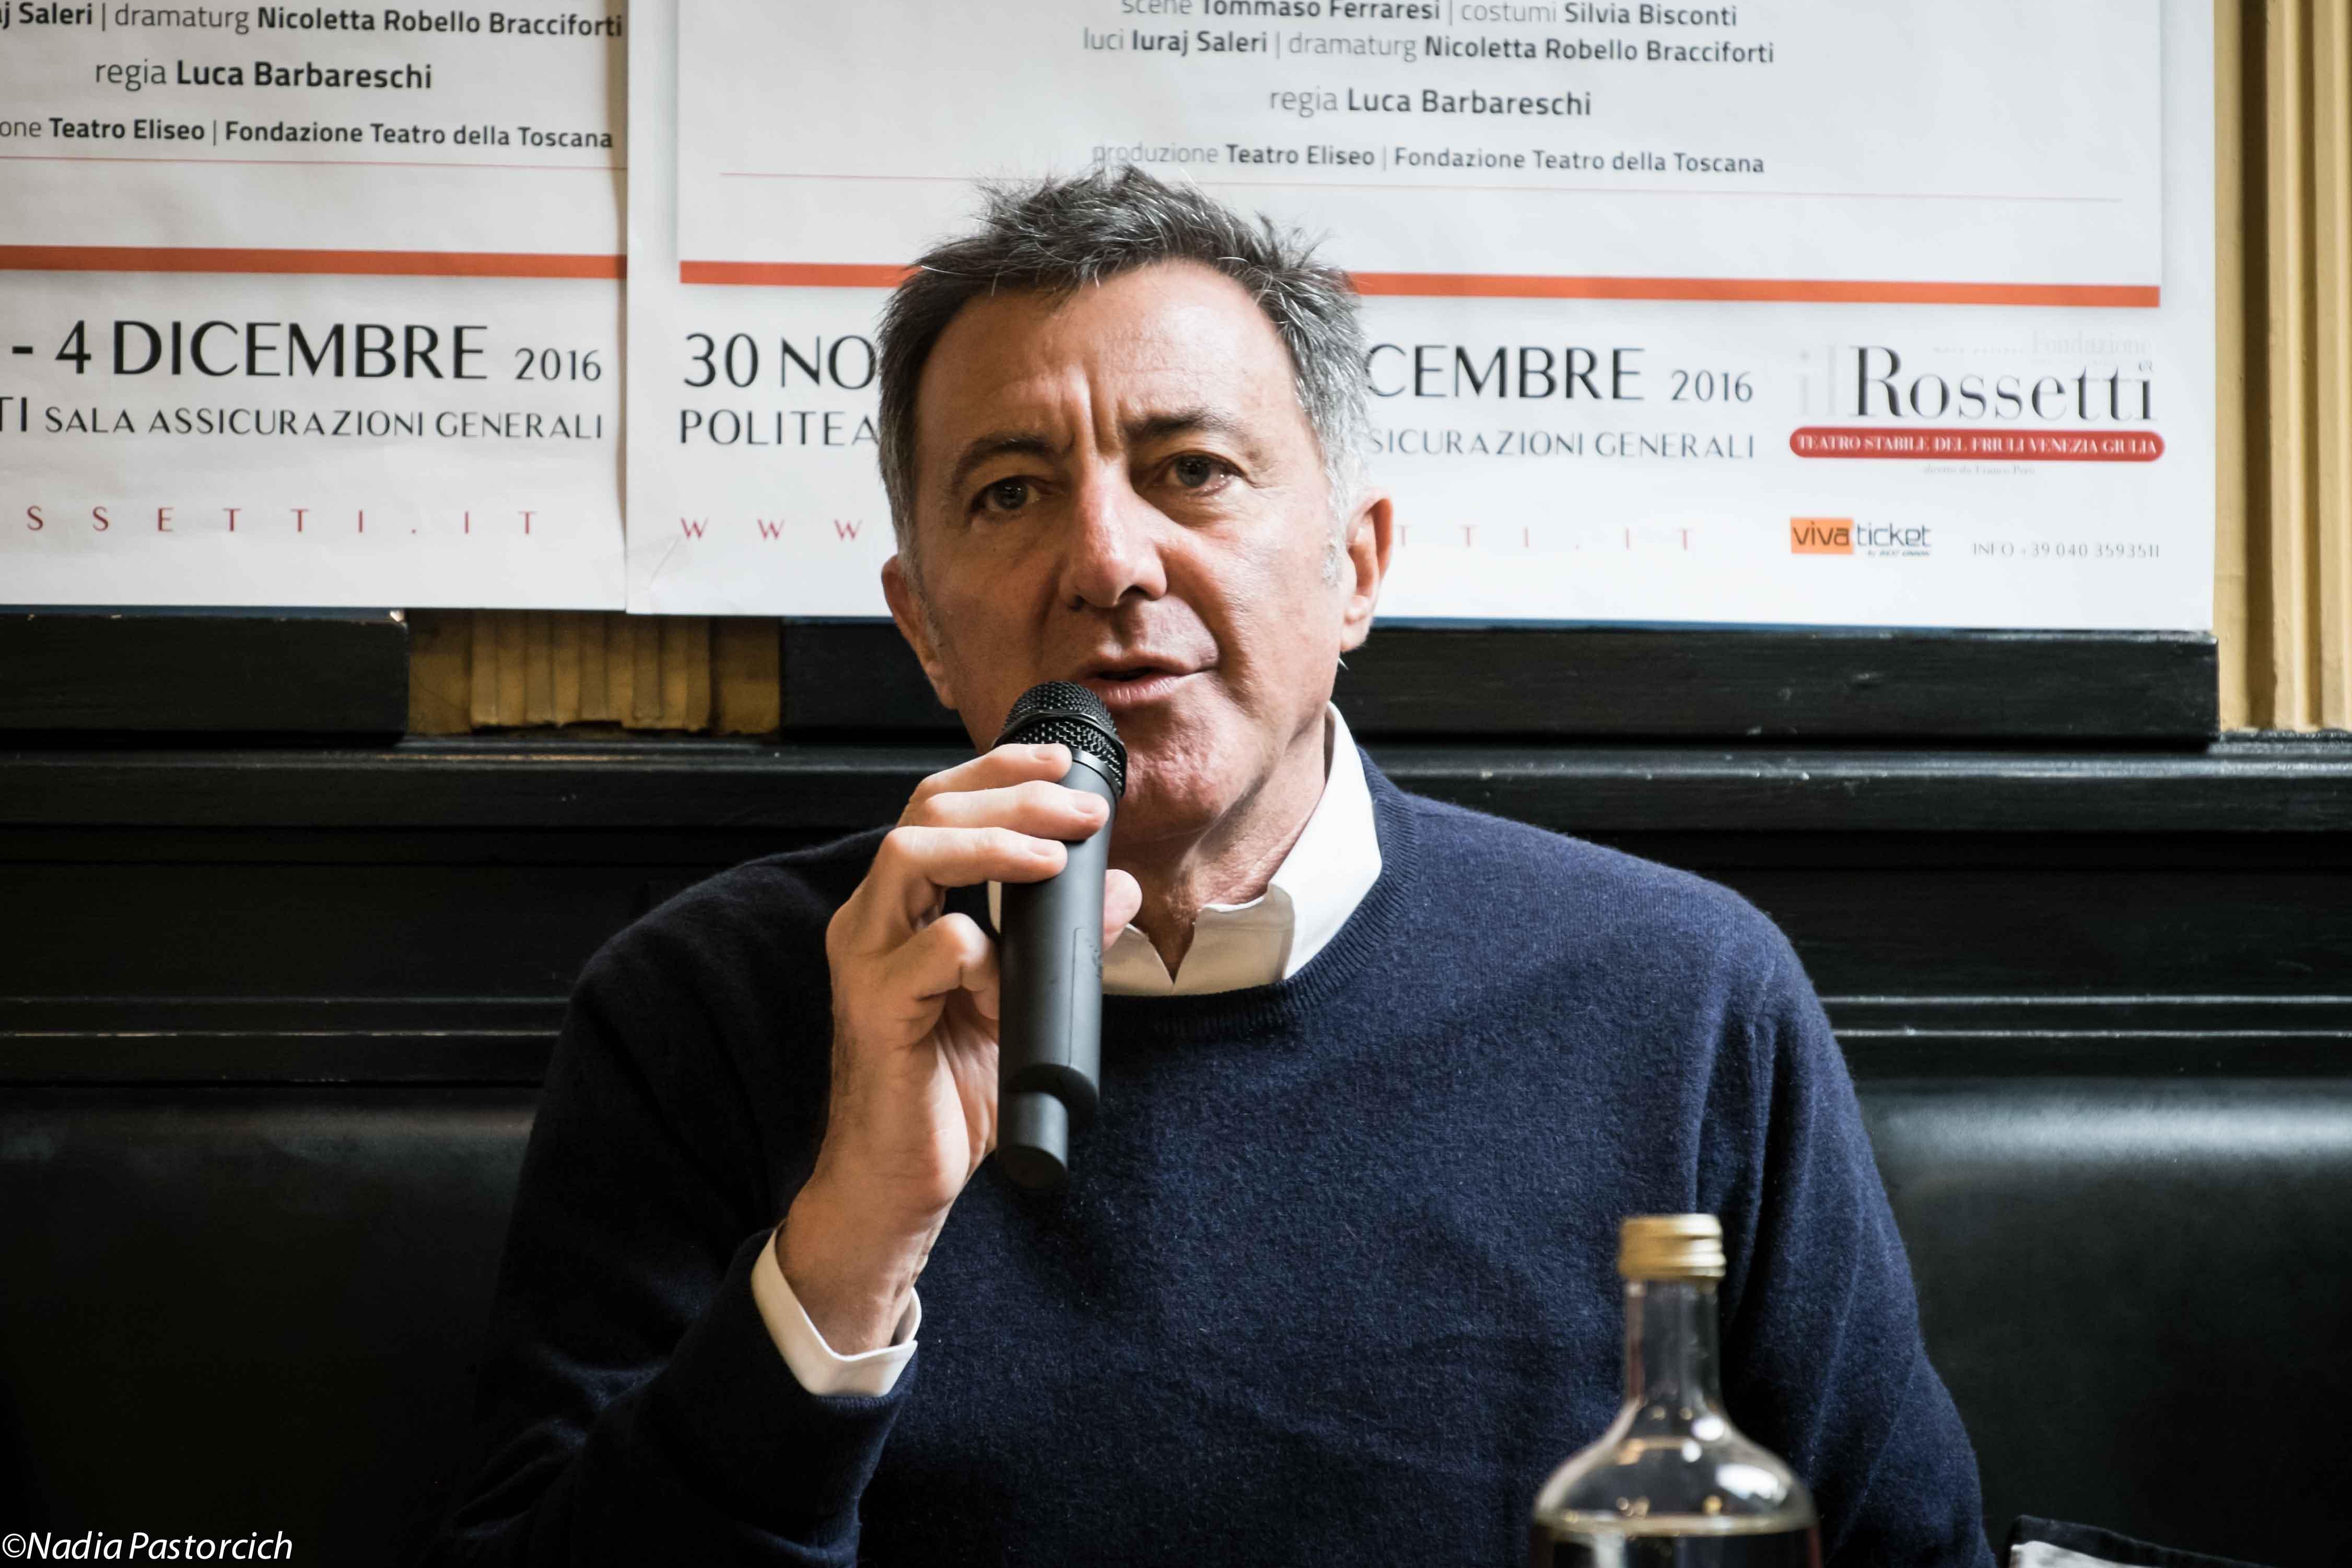 L'anatra all'arancia: la racconta Luca Barbareschi